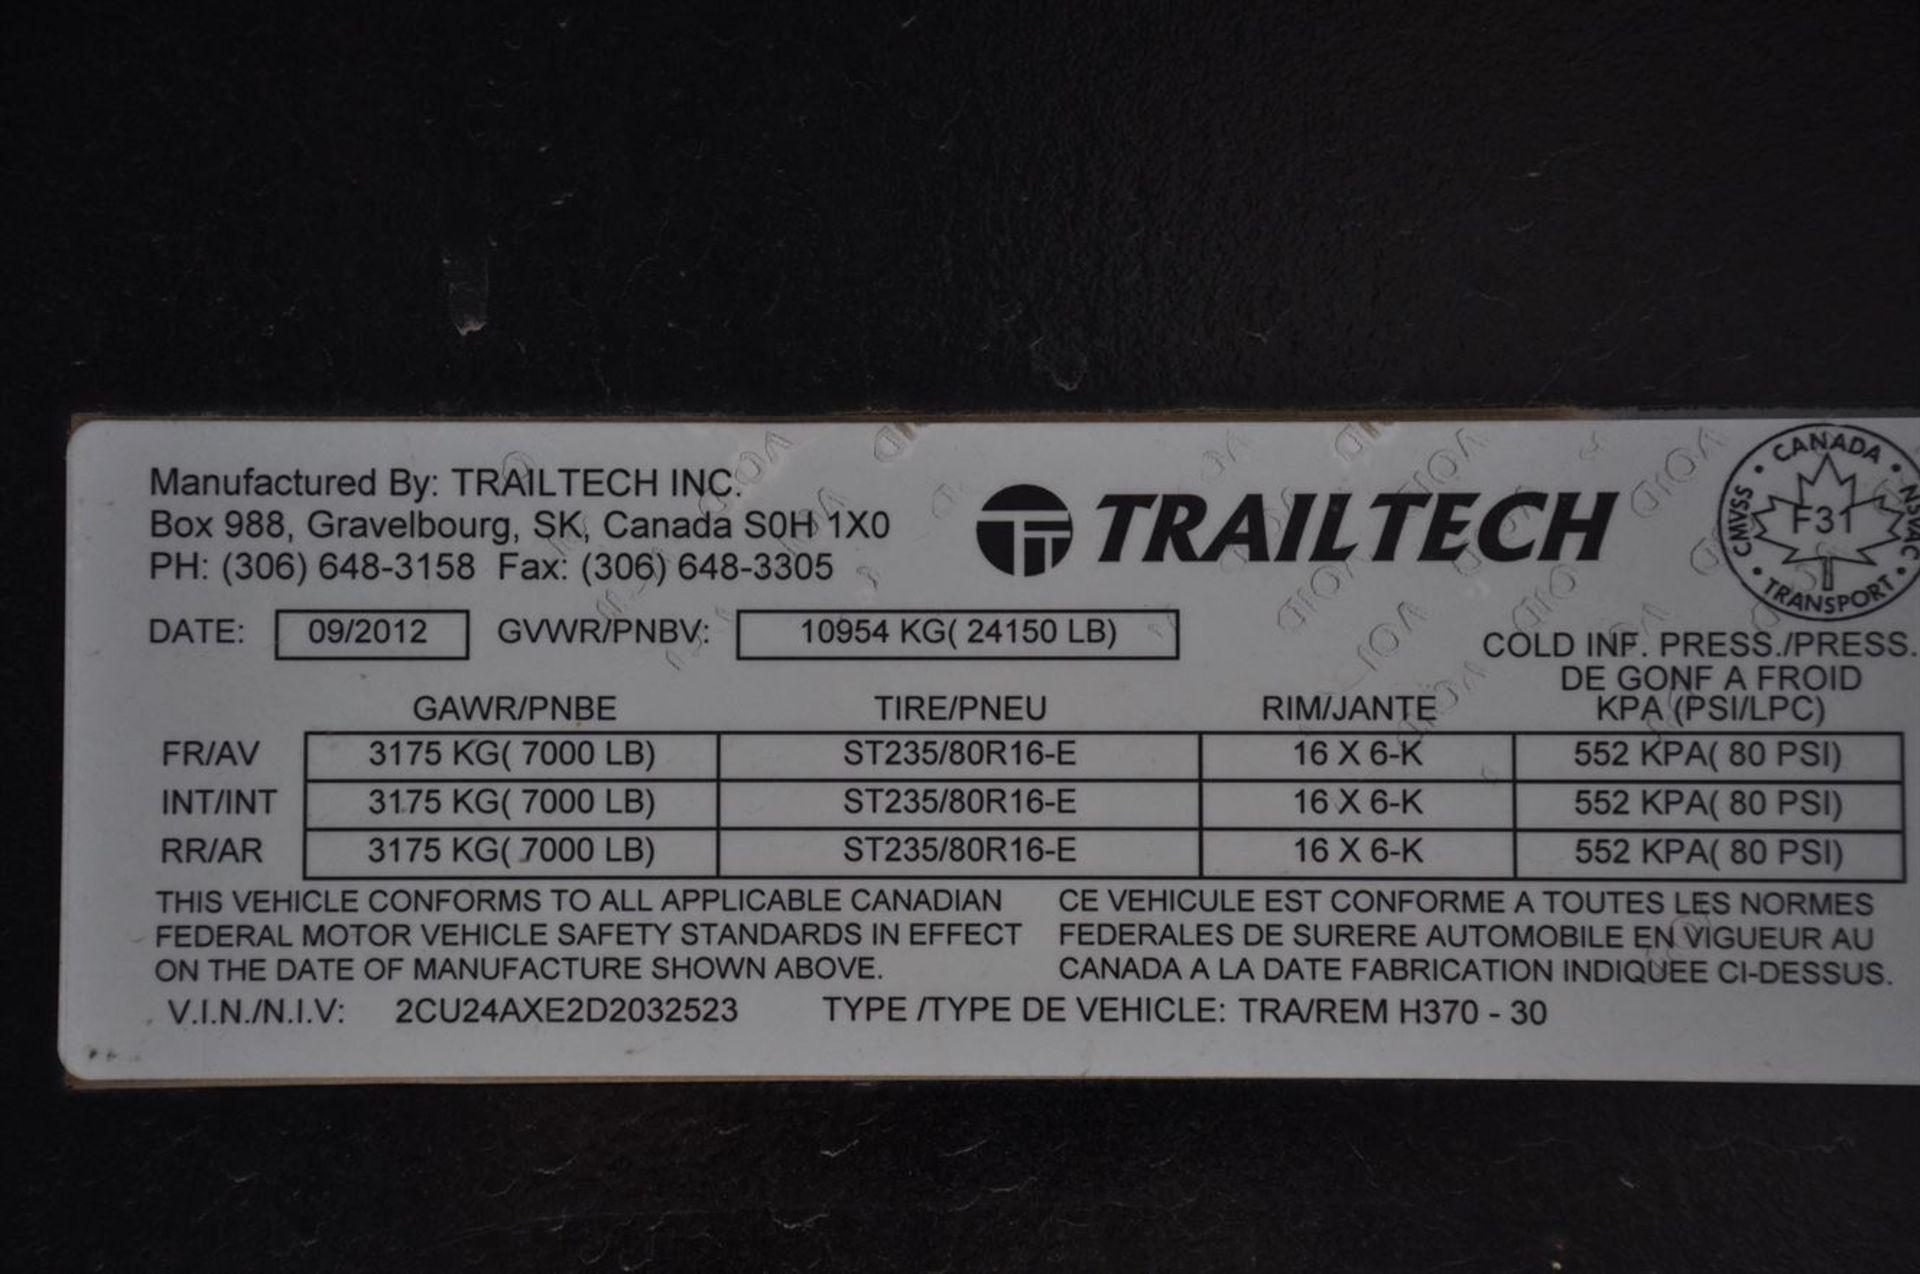 2013 TRAILTECH H370-30 Tri-Axle Gooseneck Trailer, VIN 2CU24AXE2D2032523, w/ 30' Wood Deck - Image 2 of 7